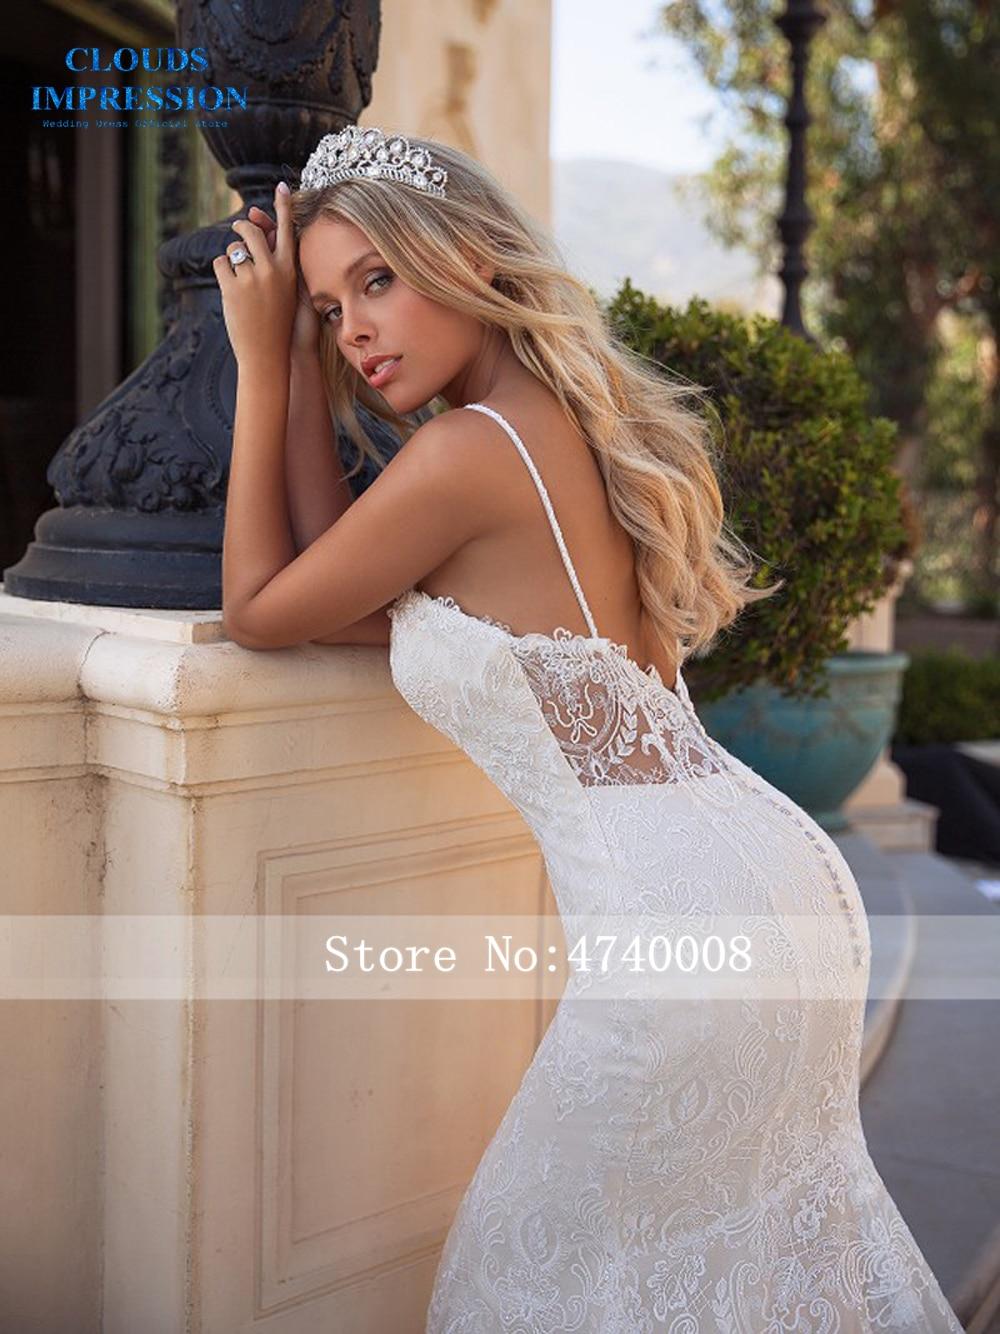 CLOUDS IMPRESSION Sexy Gorgeous Mermaid 2019 Wedding Dress Beading Deep V neck Lace Plus Size Vestige De Noiva Bride Dress-in Wedding Dresses from Weddings & Events    2